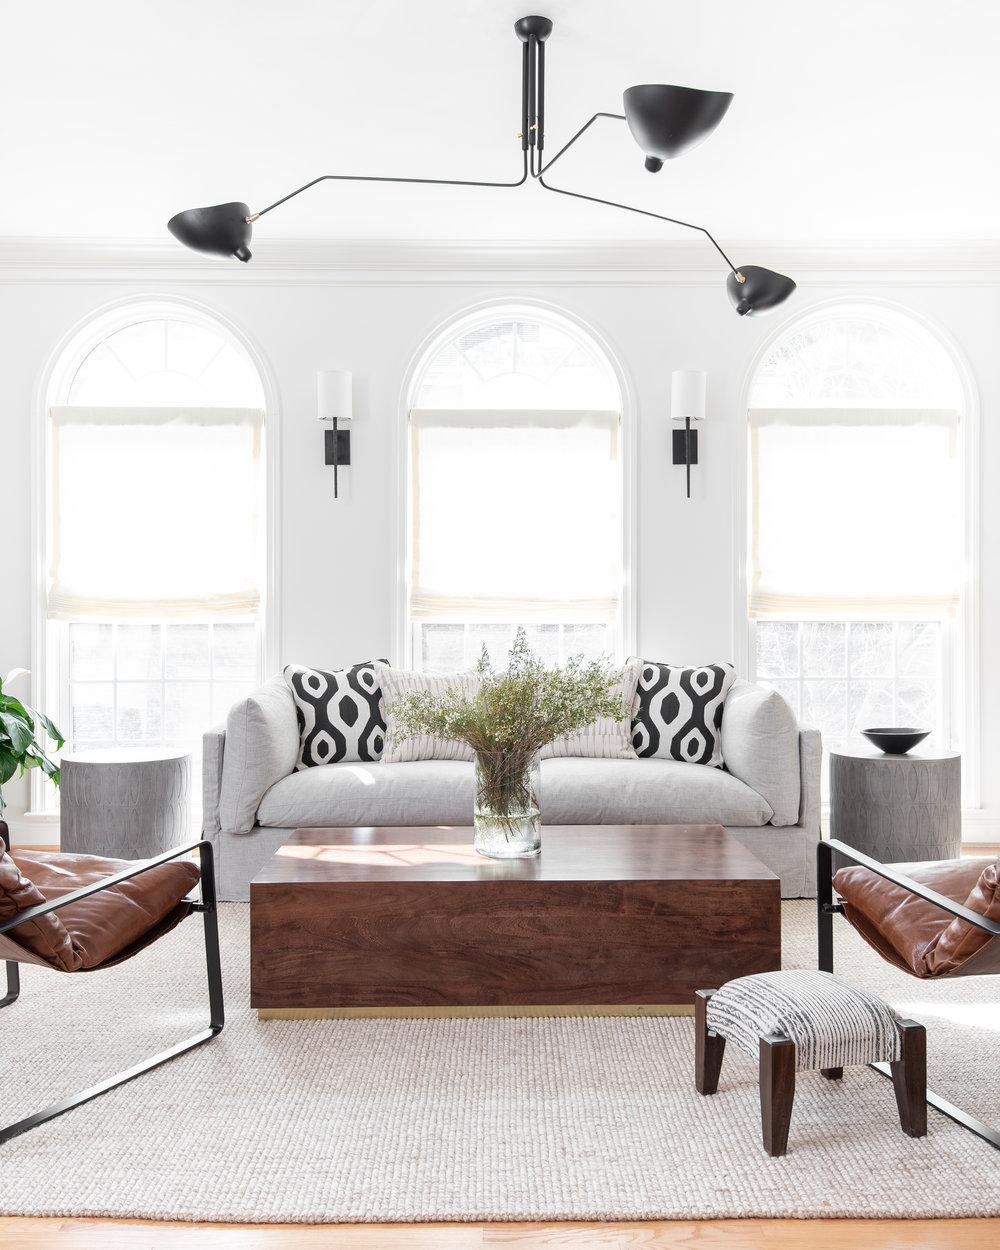 mid-century-ceiling-lamp-black-and-white-decor-bethesda-md-dmv-washington-dc-modern-design-splendor-styling-mariella-cruzado.jpg